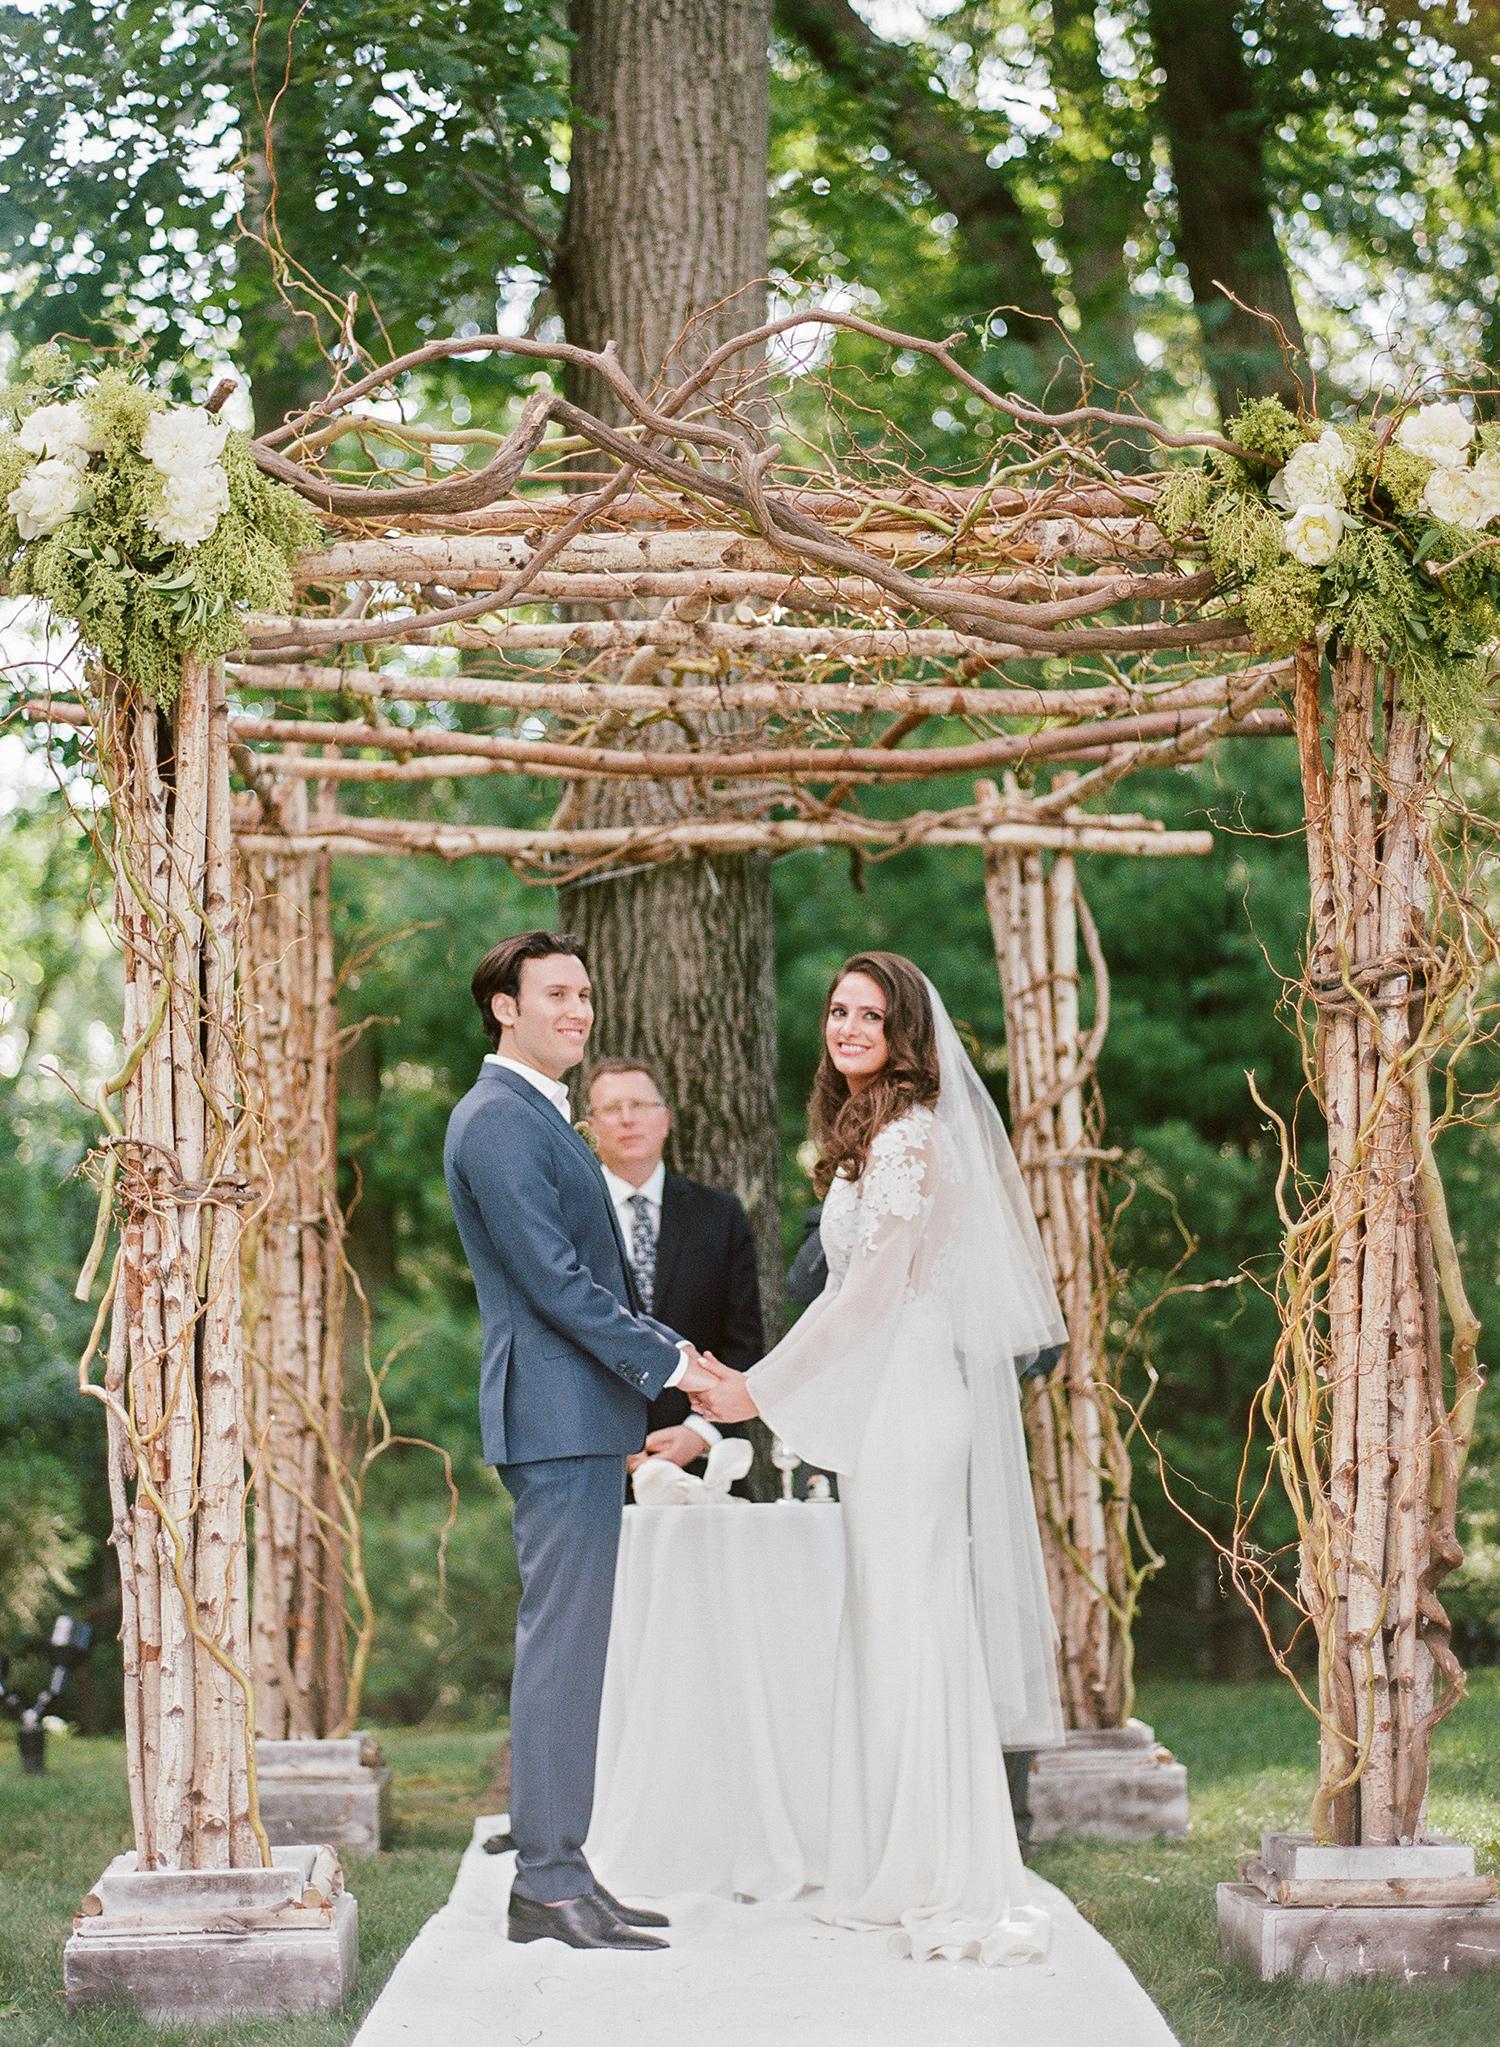 melissa michael bride and groom ceremony